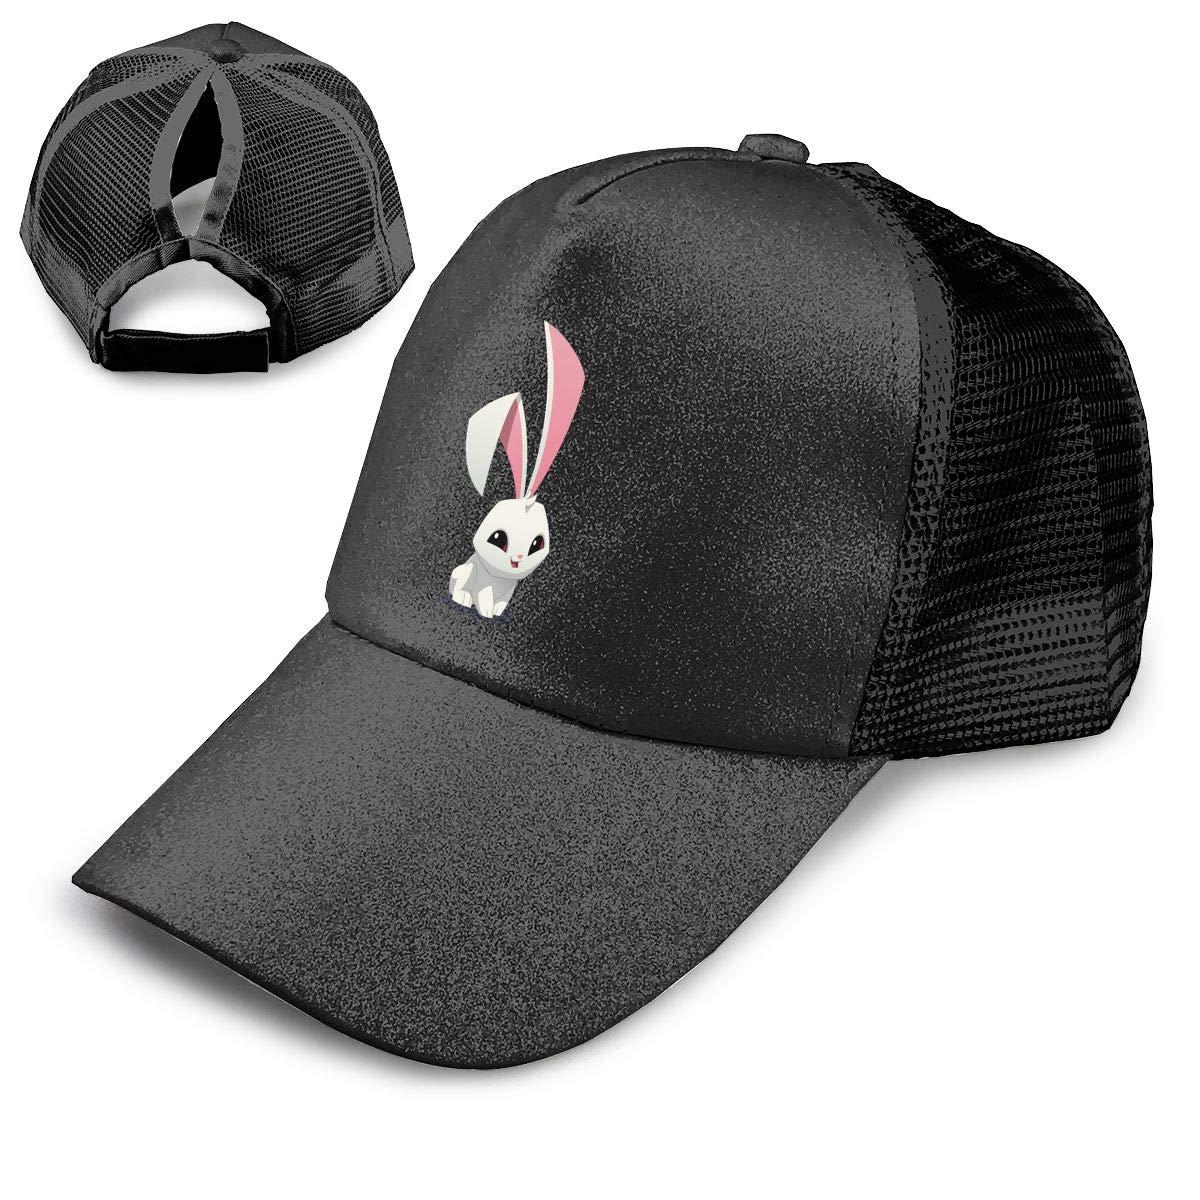 Bunny Ponytail Messy High Bun Hat Ponycaps Baseball Cap Adjustable Trucker Cap Mesh Cap